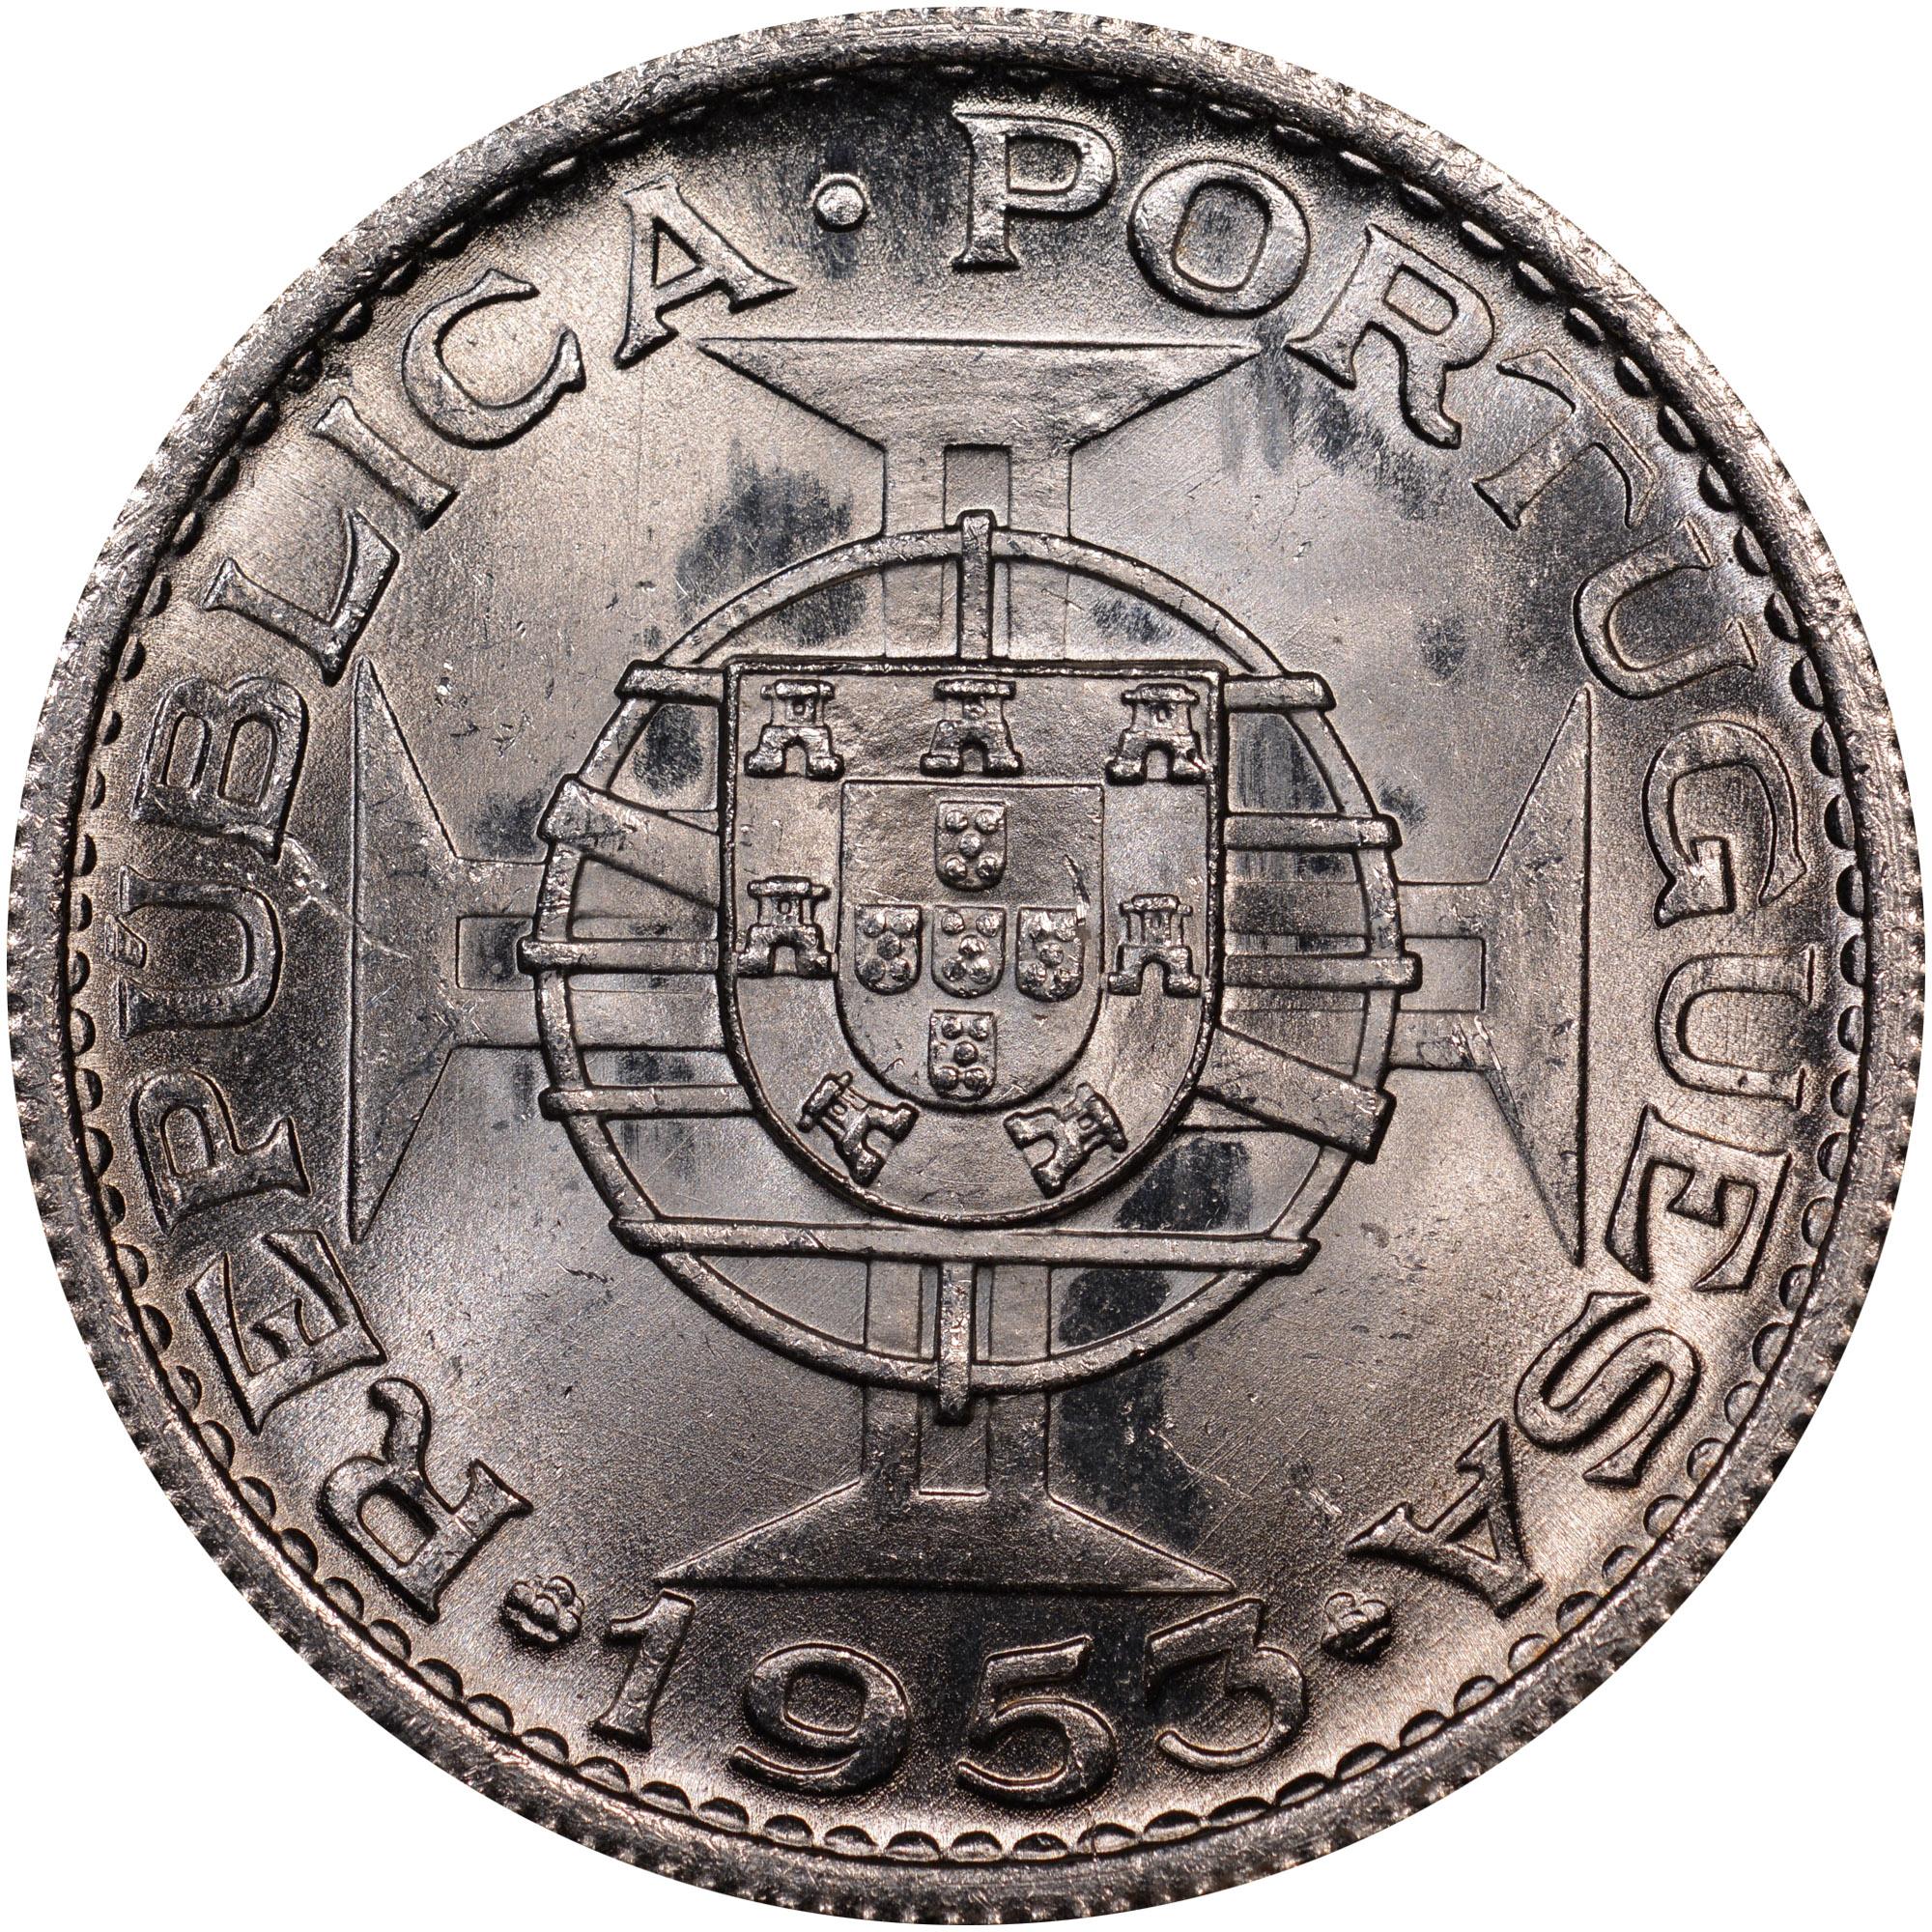 1953 Cape Verde 10 Escudos obverse